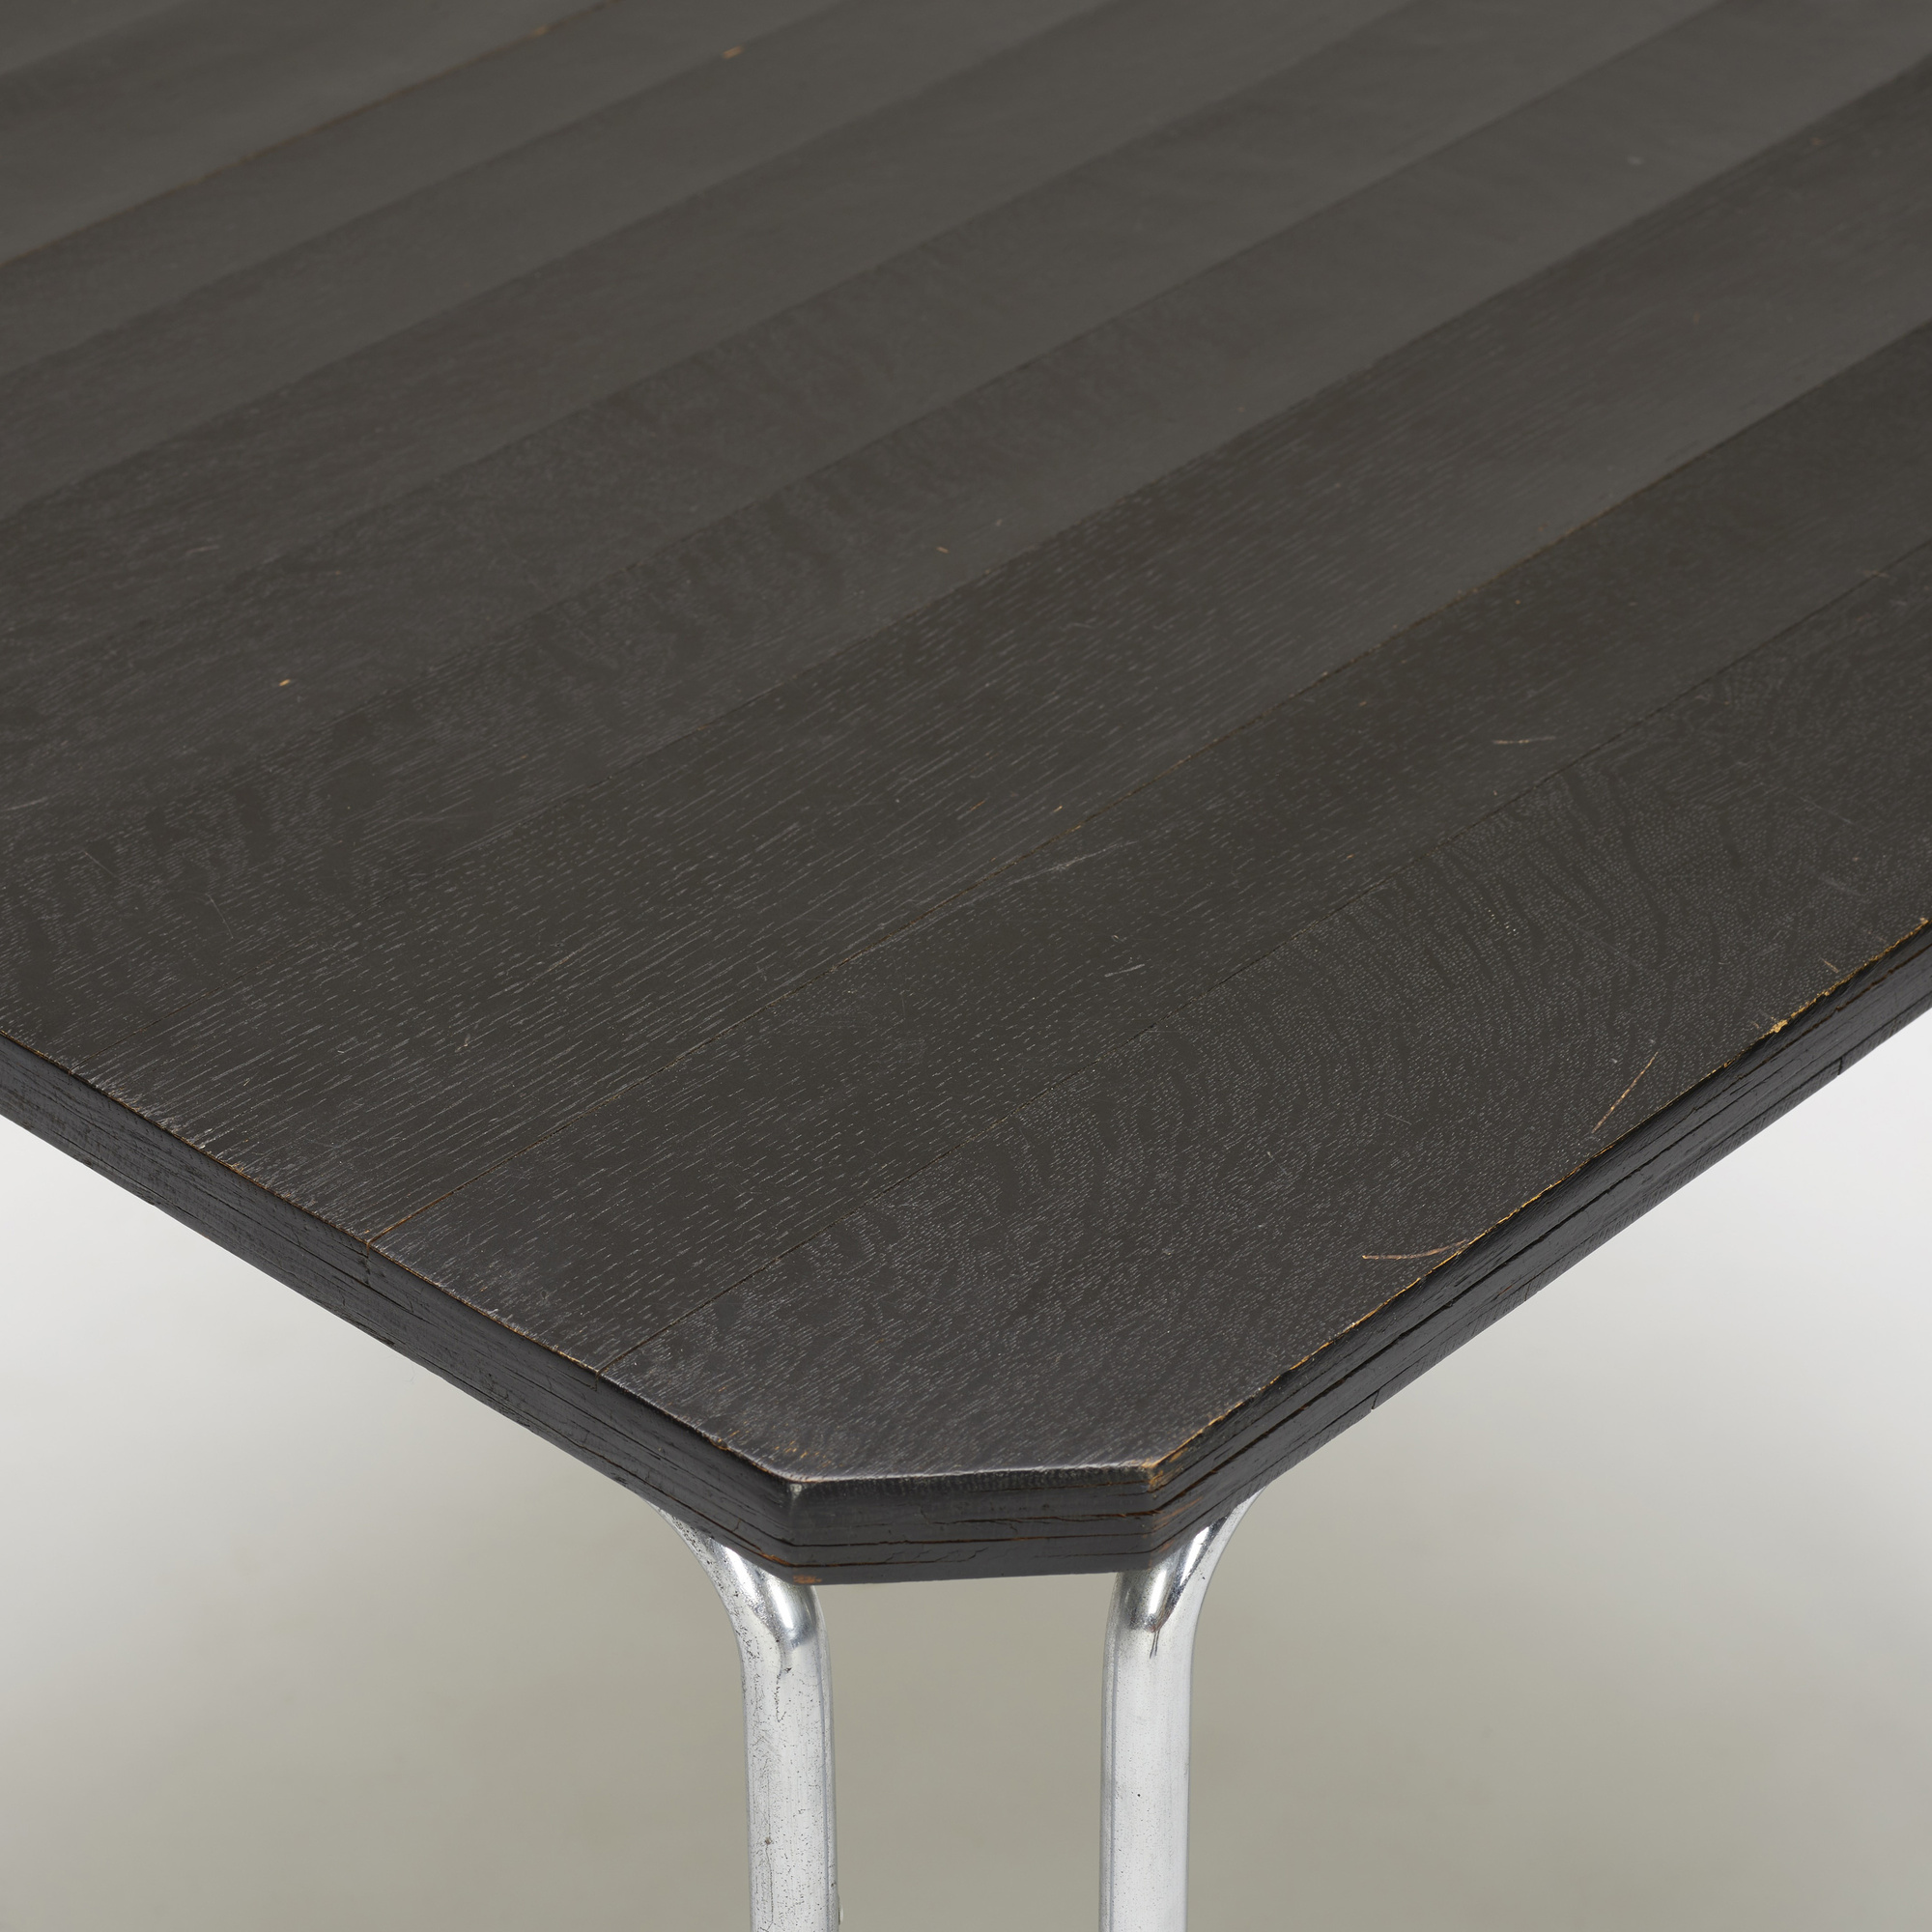 146: Marcel Breuer / table, model B10 (3 of 3)